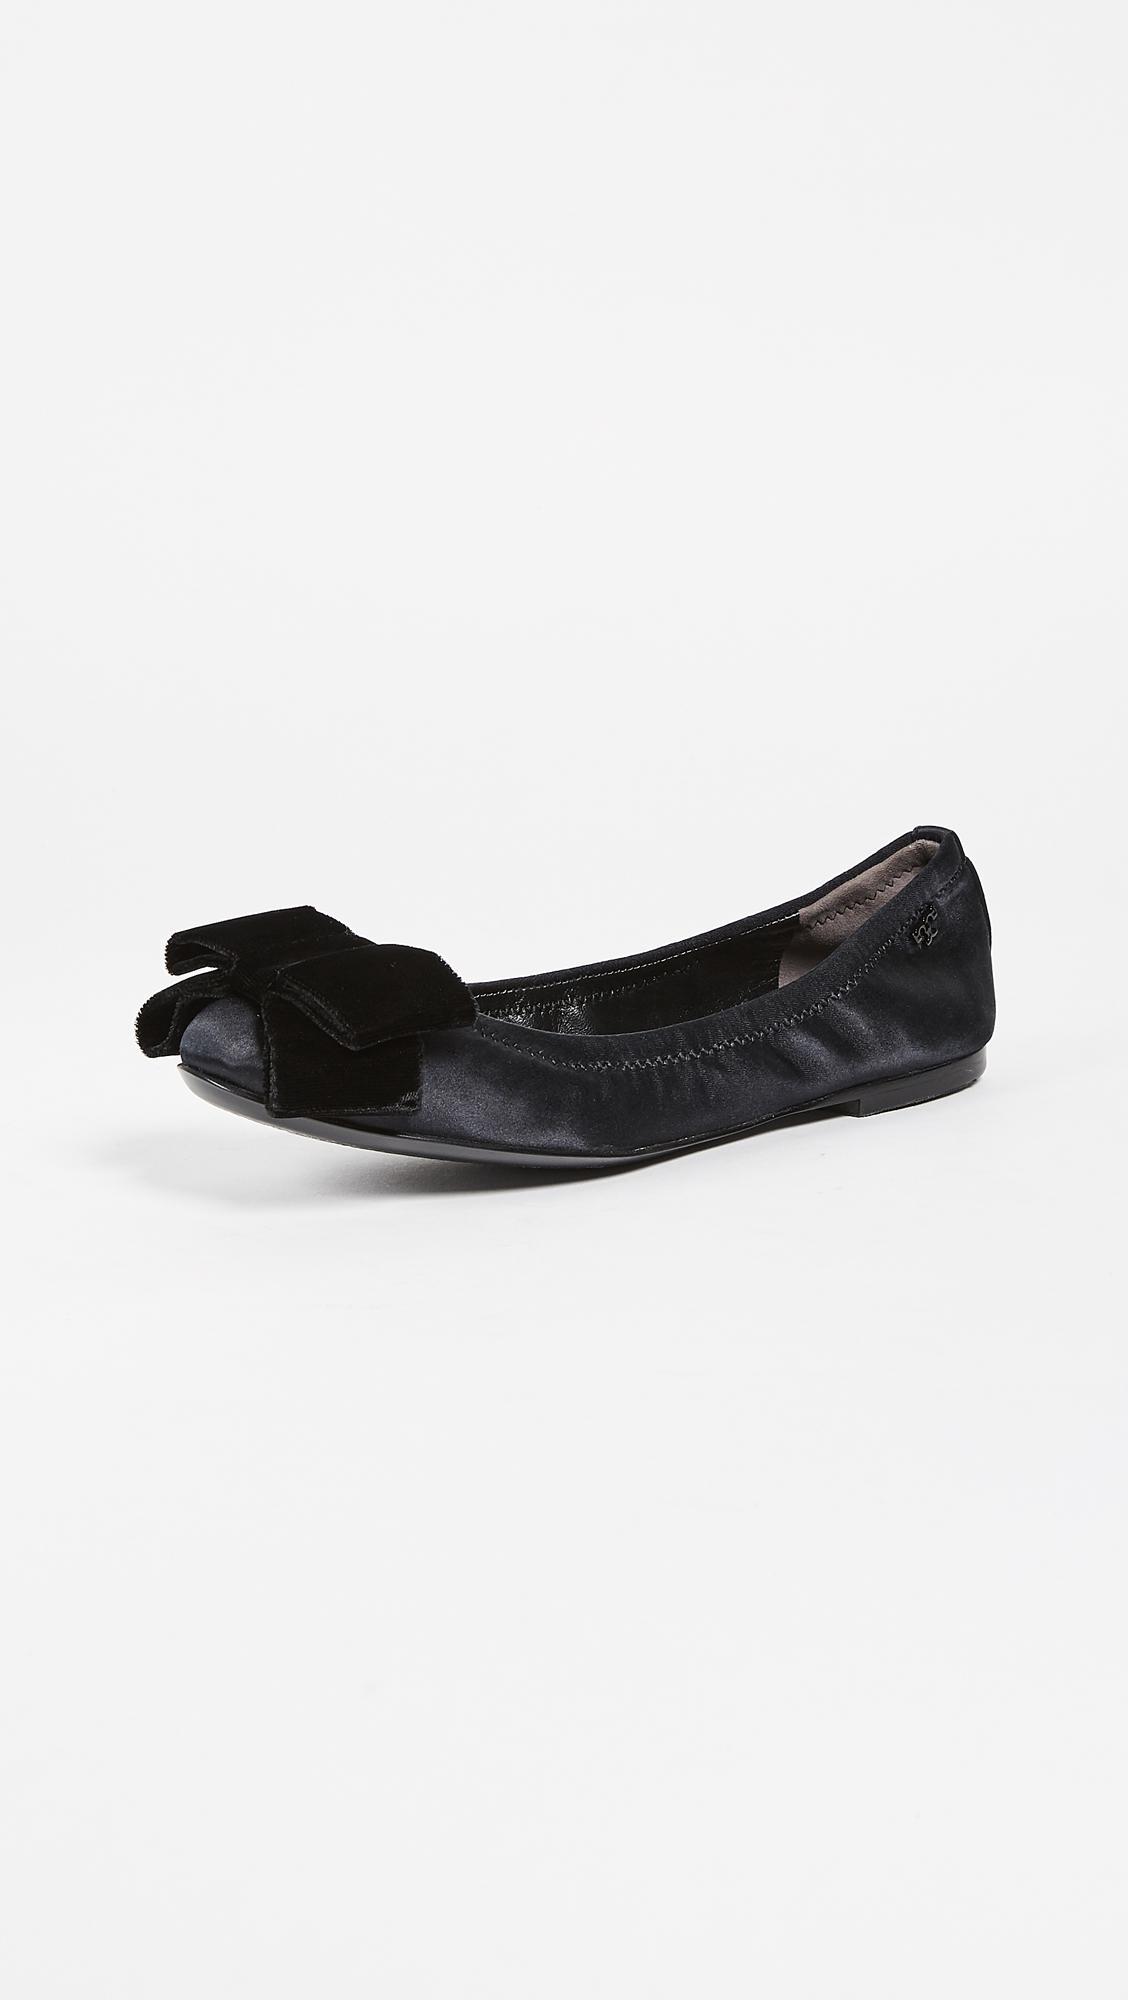 52986f126b1 Lyst - Tory Burch Viola Bow Ballet Flats in Black